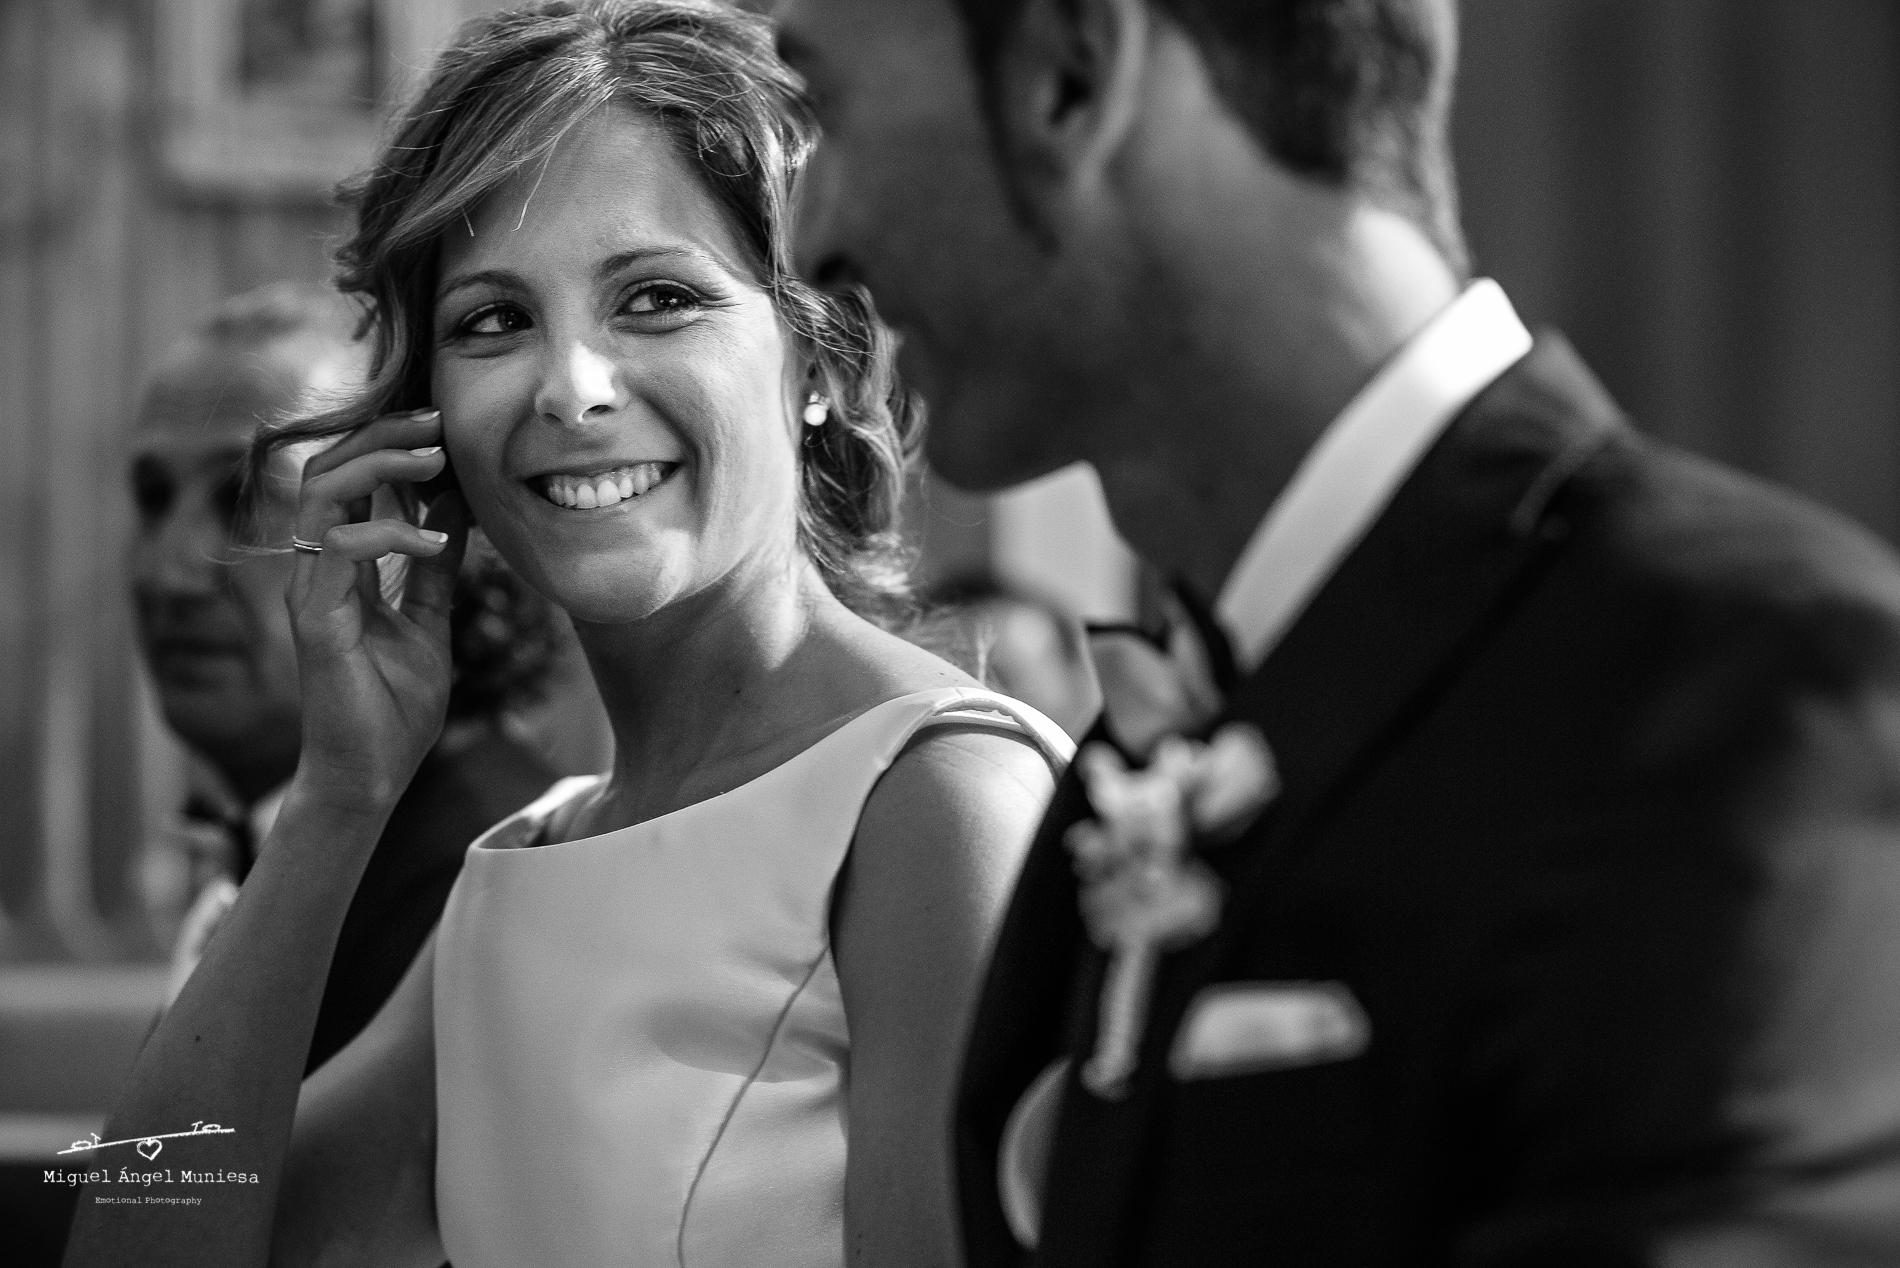 boda, fotografia de boda, boda zaragoza, fotografia, wedding, wedding photography, miguel angel muniesa, fotografo boda Zaragoza, fotografo boda, destination wedding_ 026